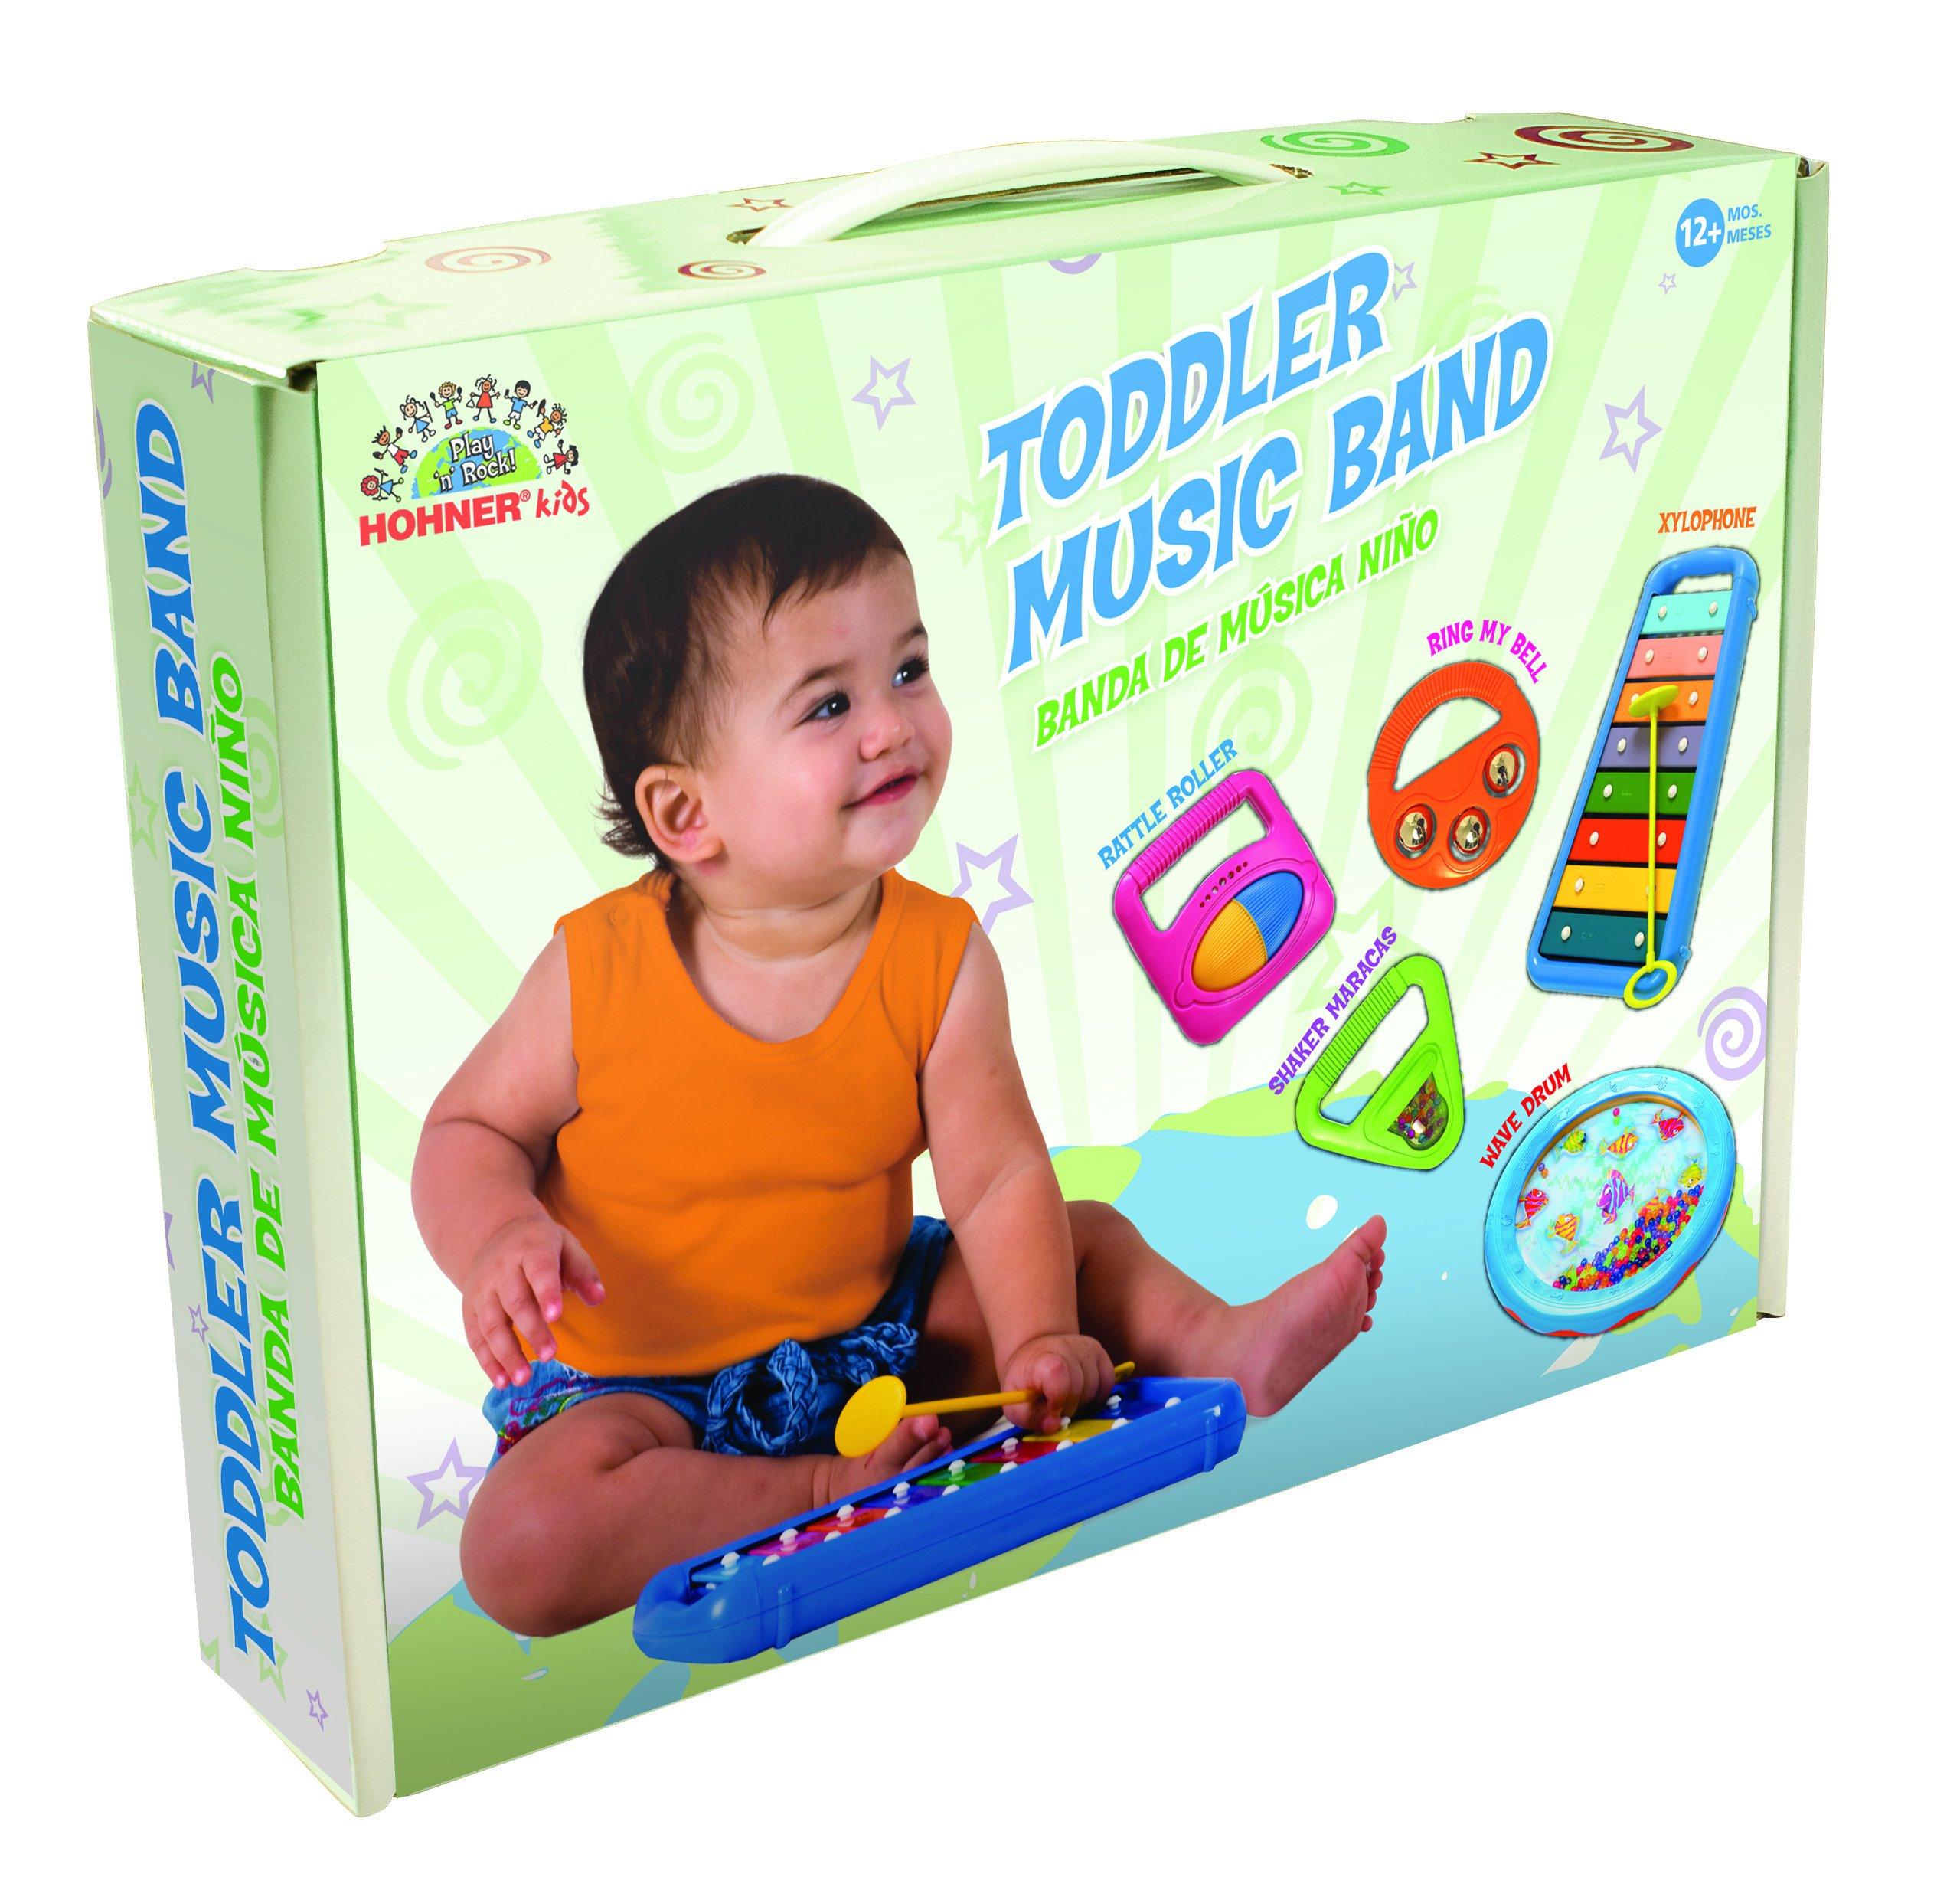 Hohner Kids Toddler Music Band by Hohner Kids